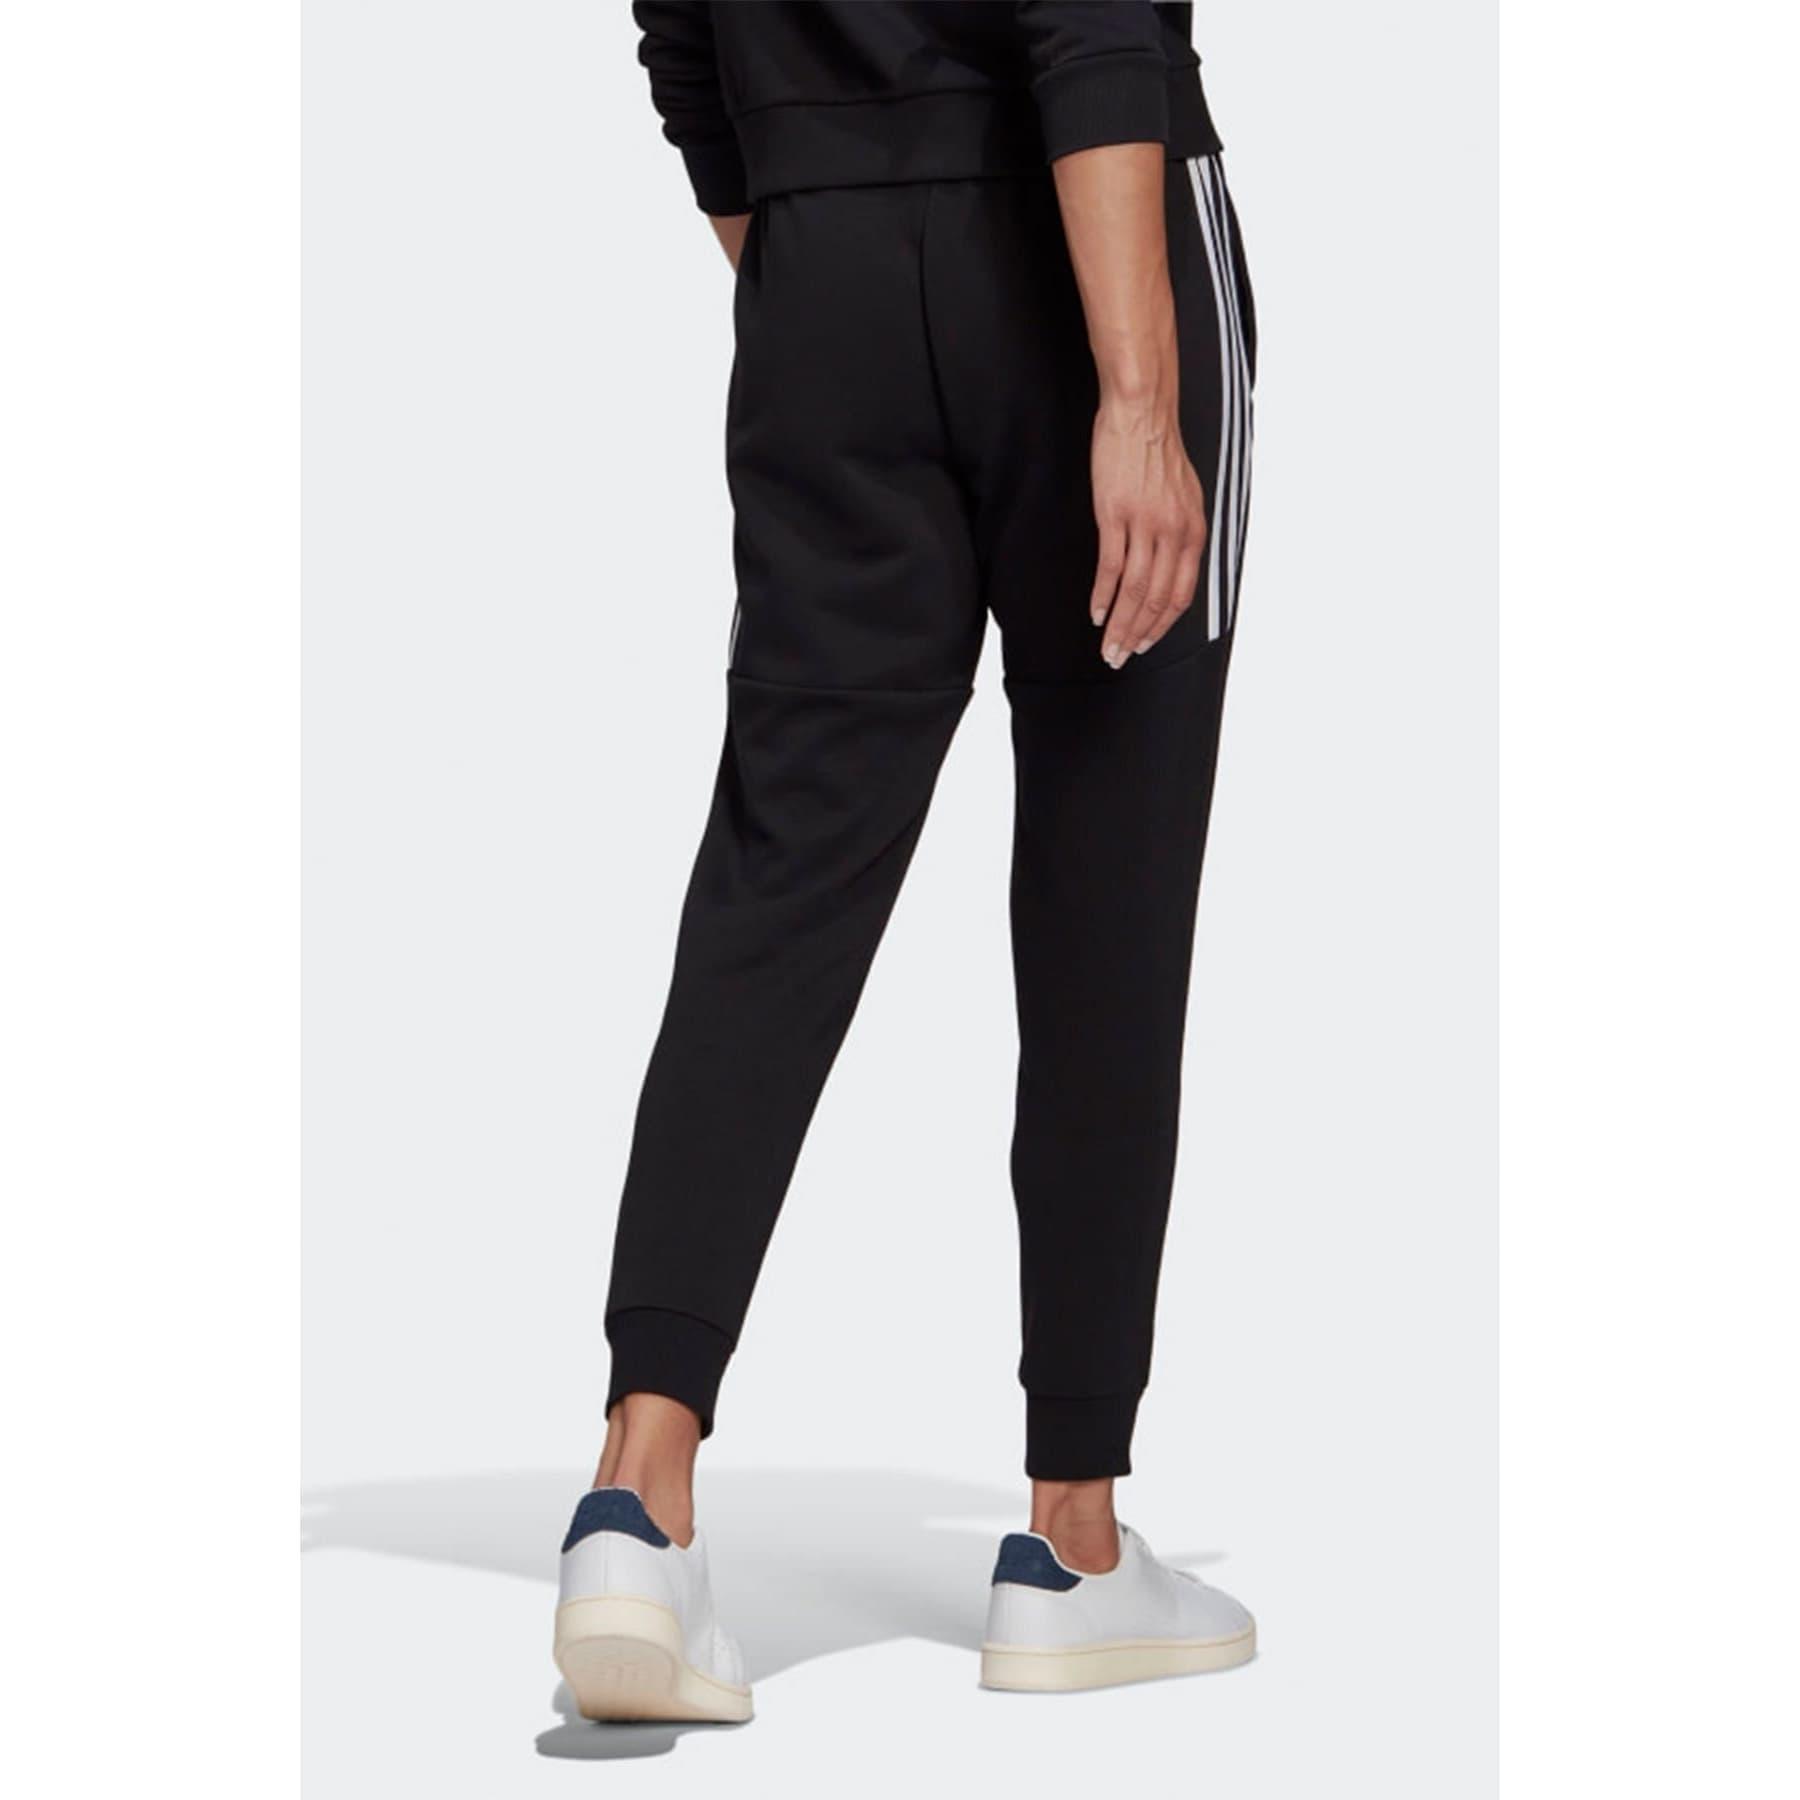 Essentials Cut 3-Stripes Kadın Siyah Eşofman Altı (GL1372)